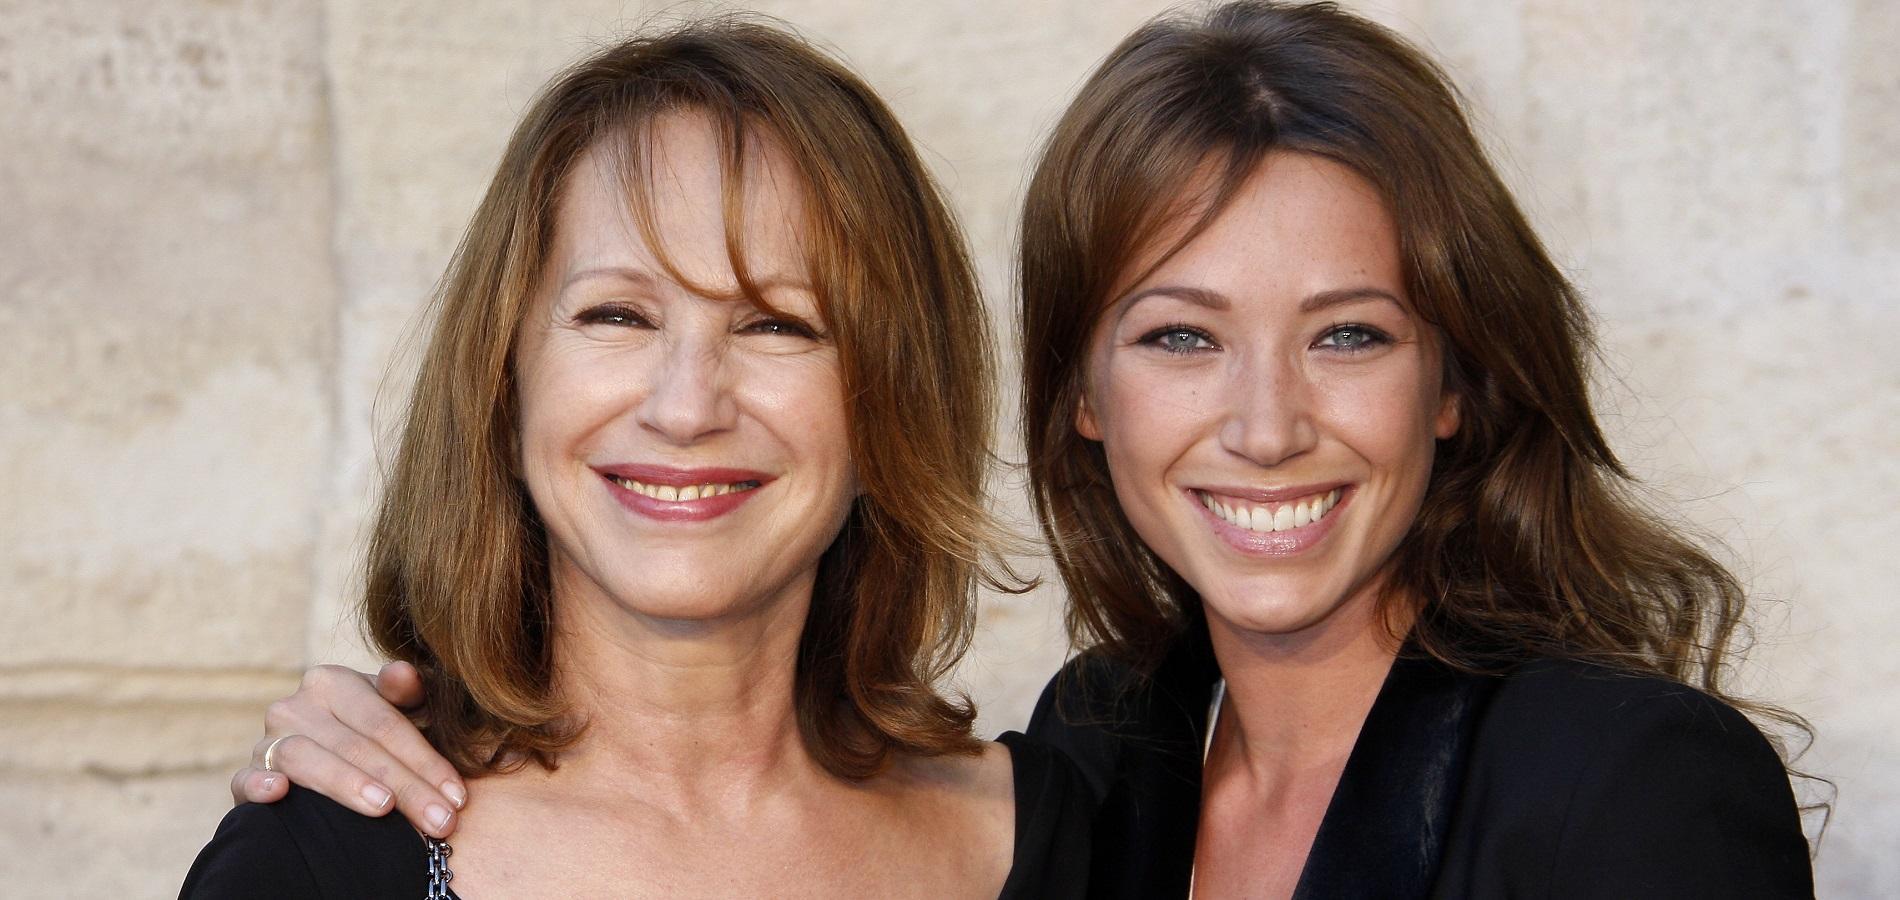 La ressemblance frappante entre Nathalie Baye adolescente et Laura Smet